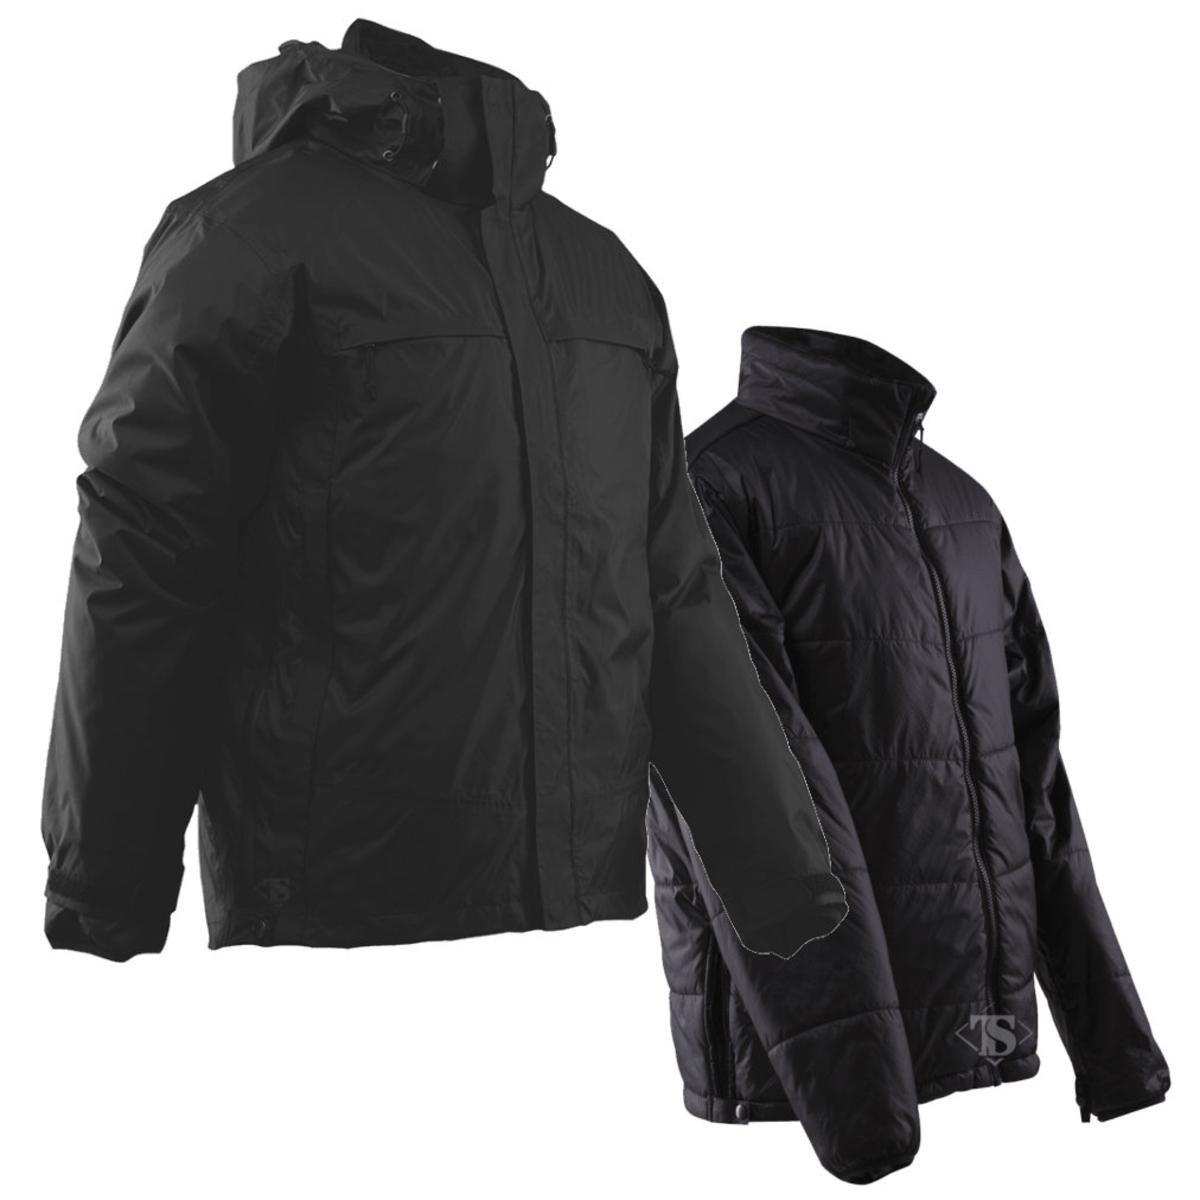 TRU-SPEC 2413007 H2O Proof 3-in-1 Jacket, XX-Large Regular, Black